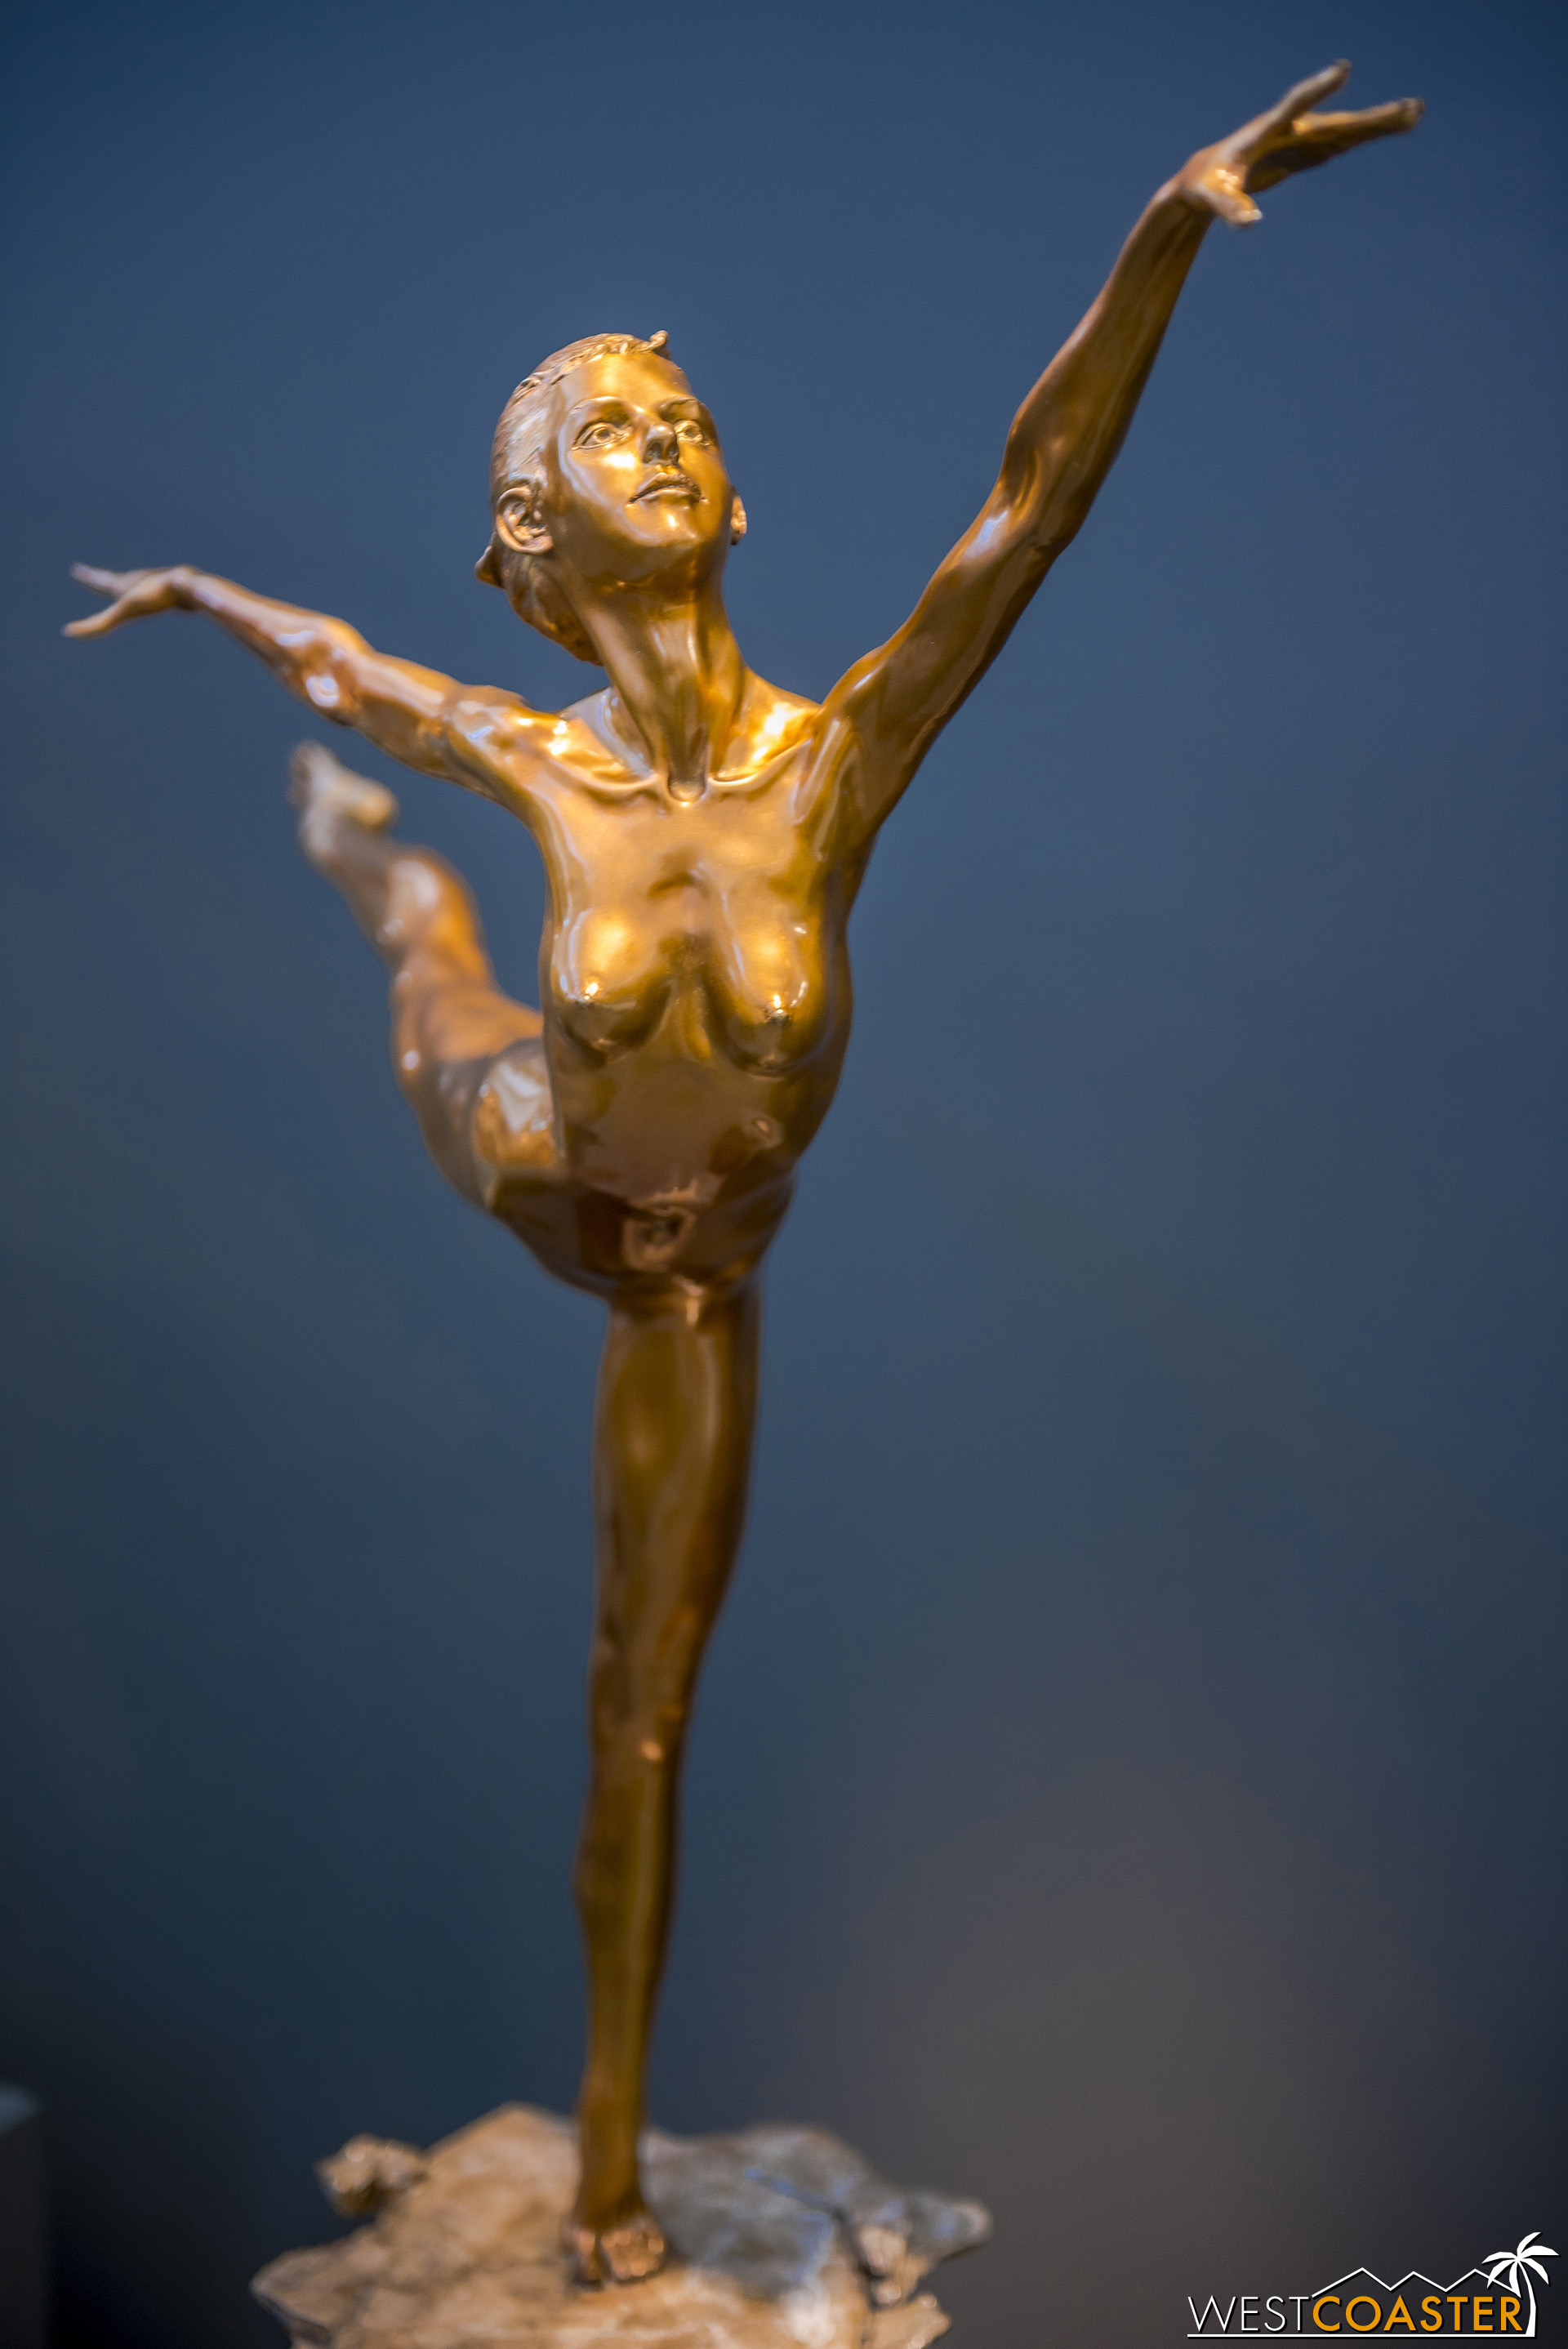 He enjoys capturing the elegance, composure, strength, and control of dancers.